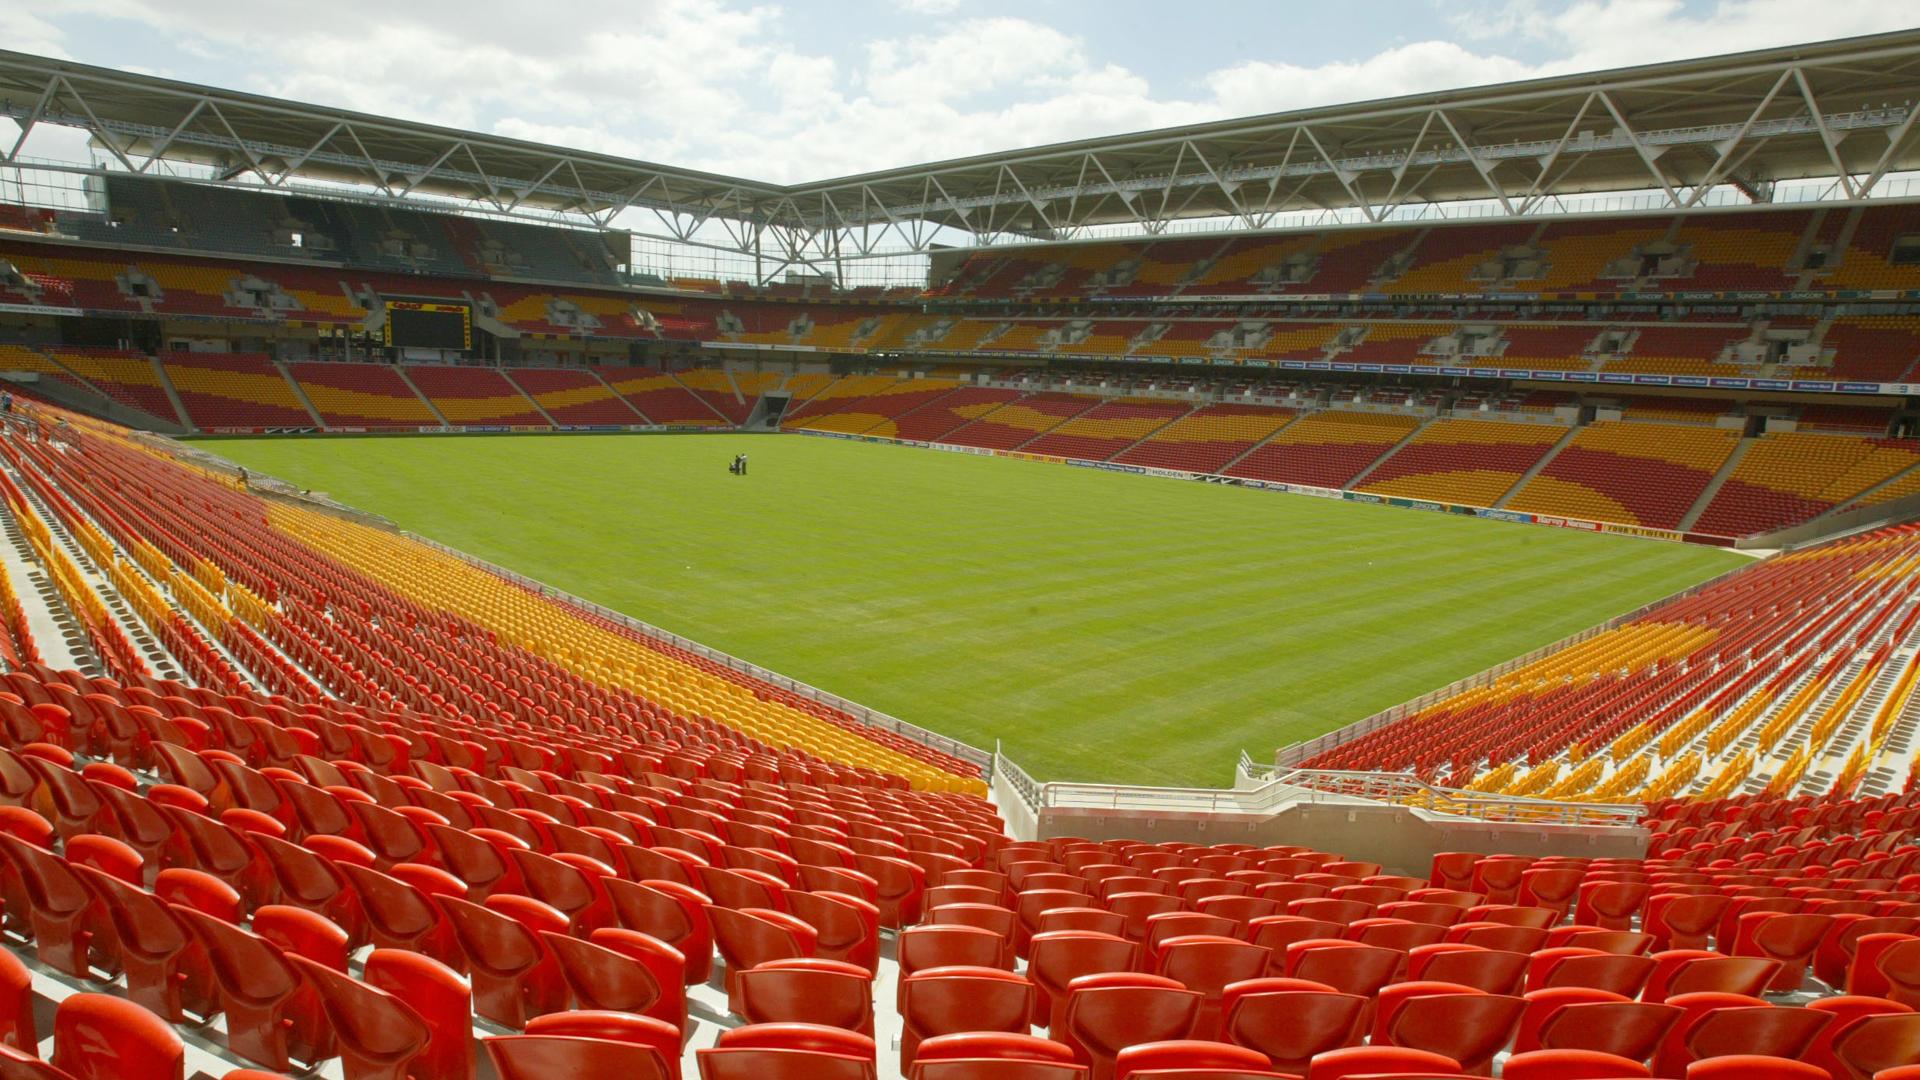 Coronavirus: NRL announces six venues to be used when season resumes